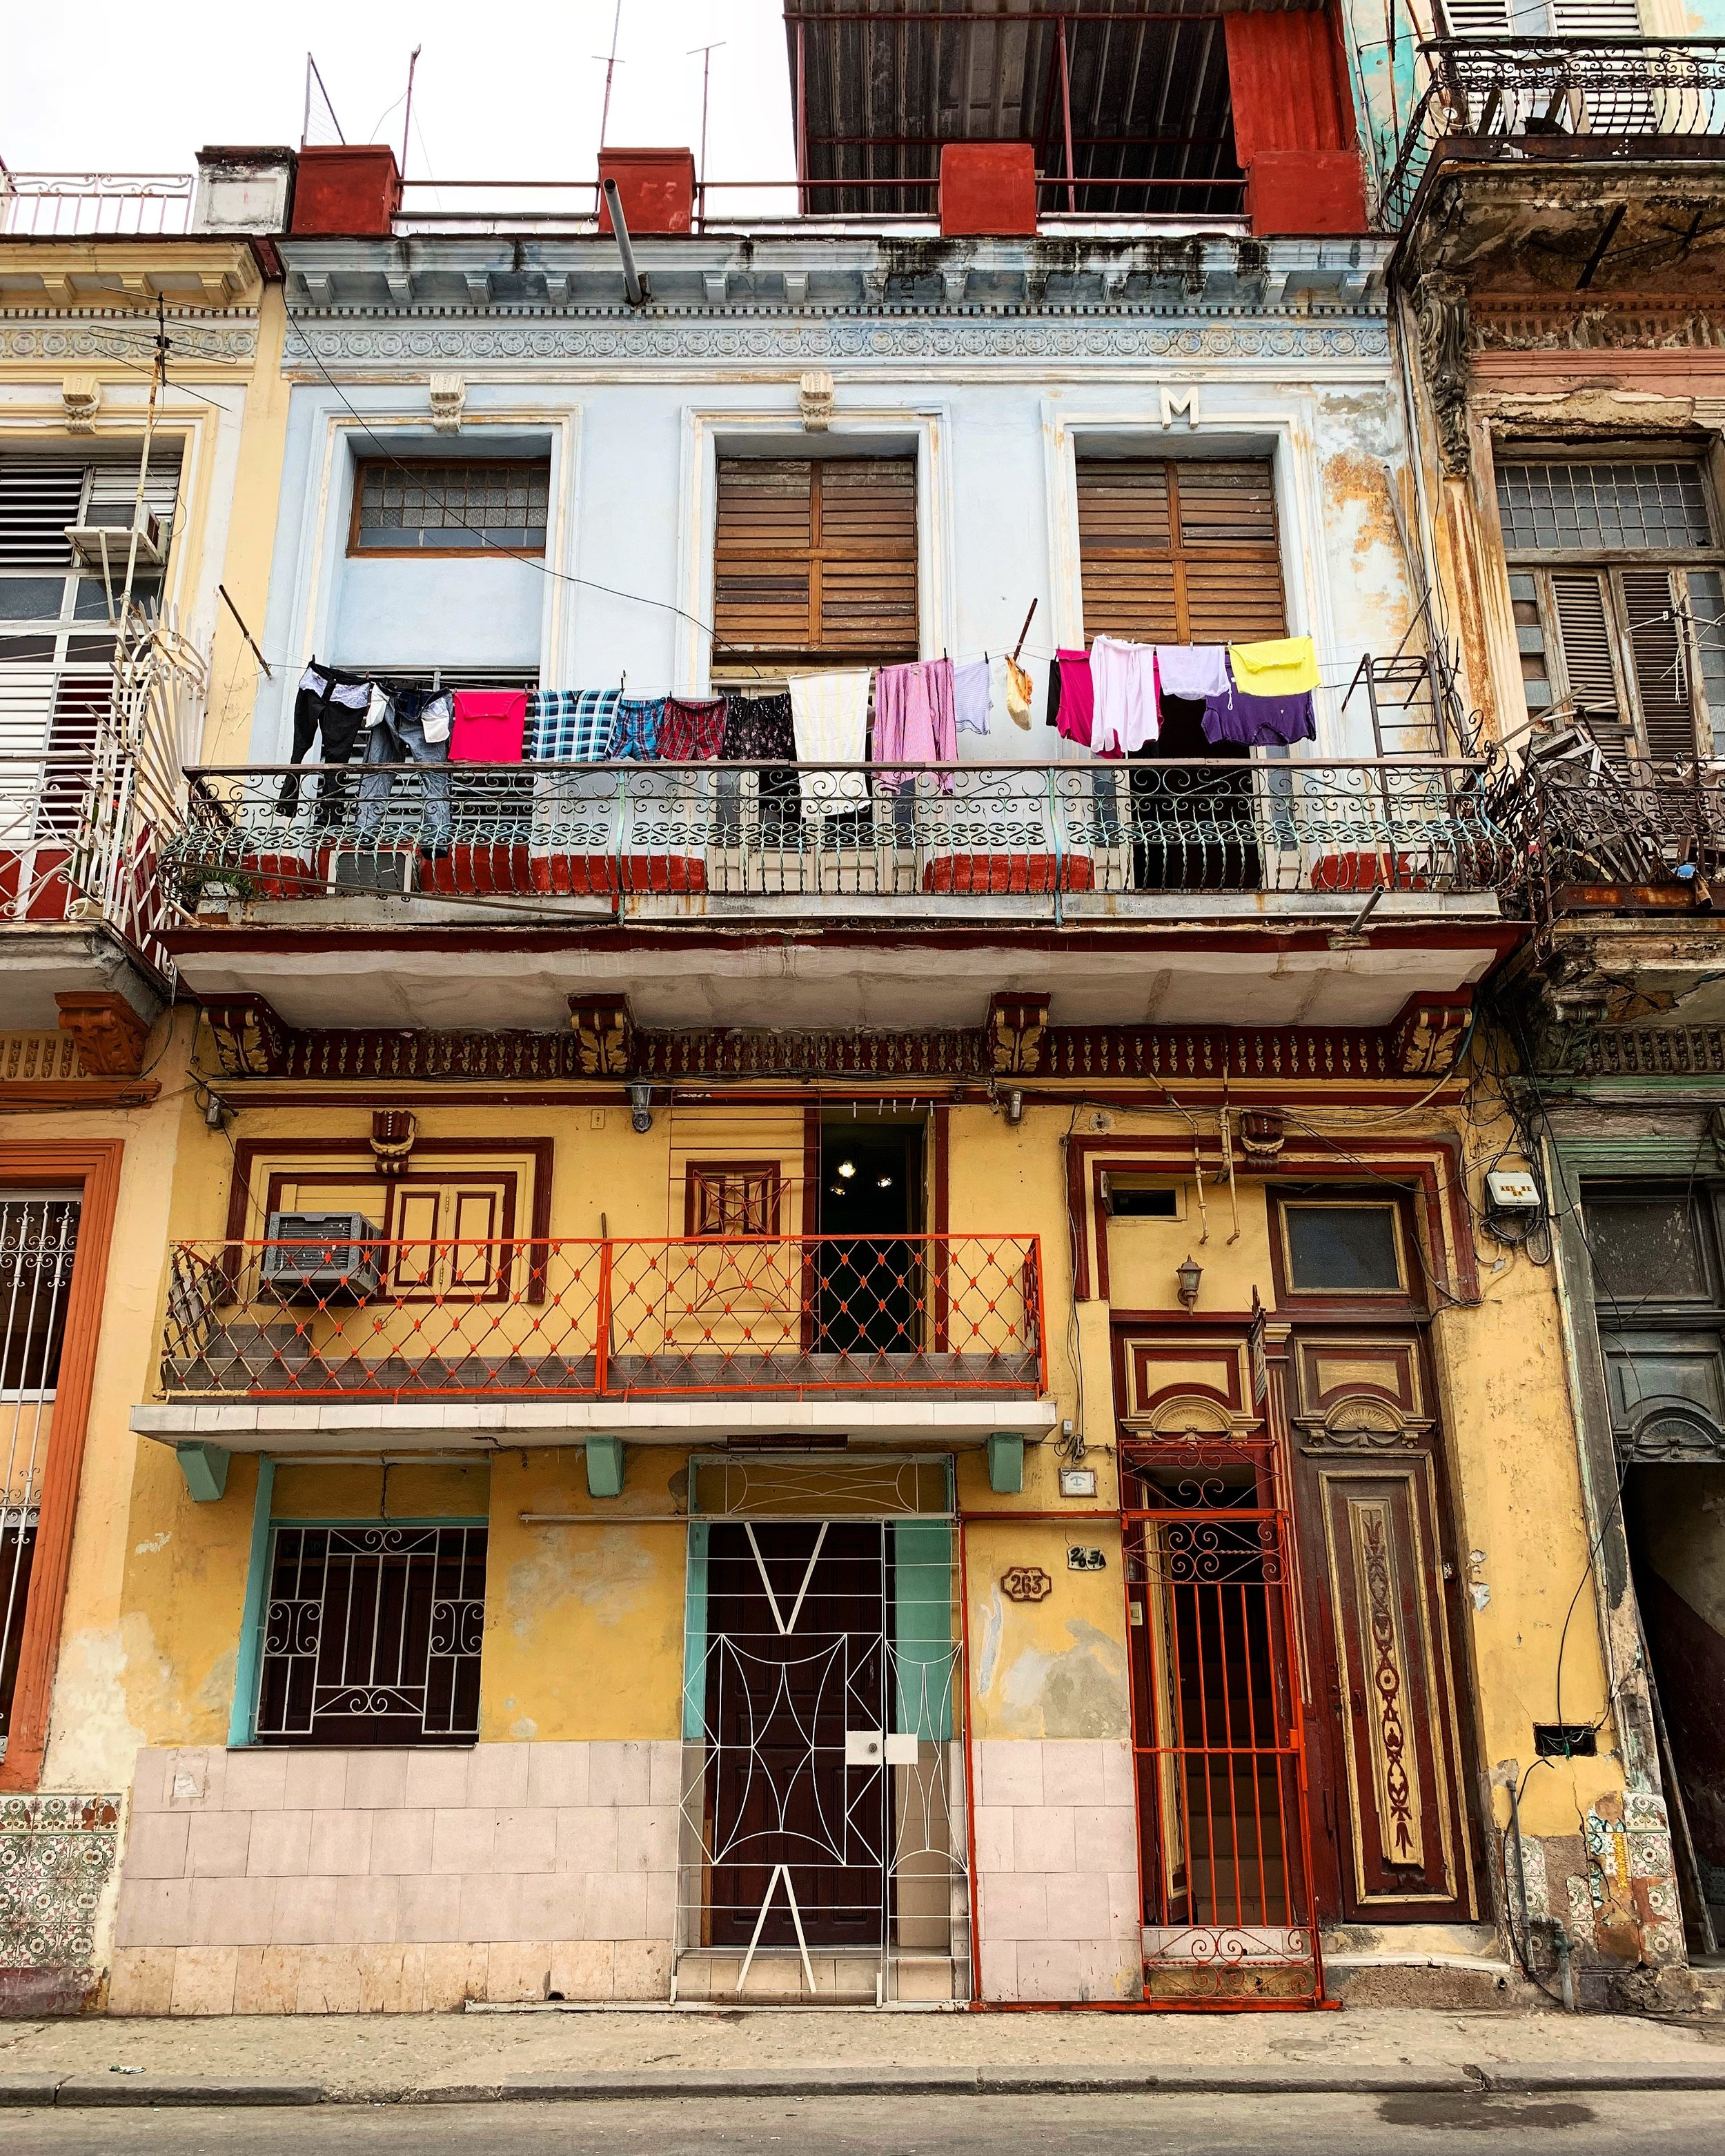 where do Havana locals live?